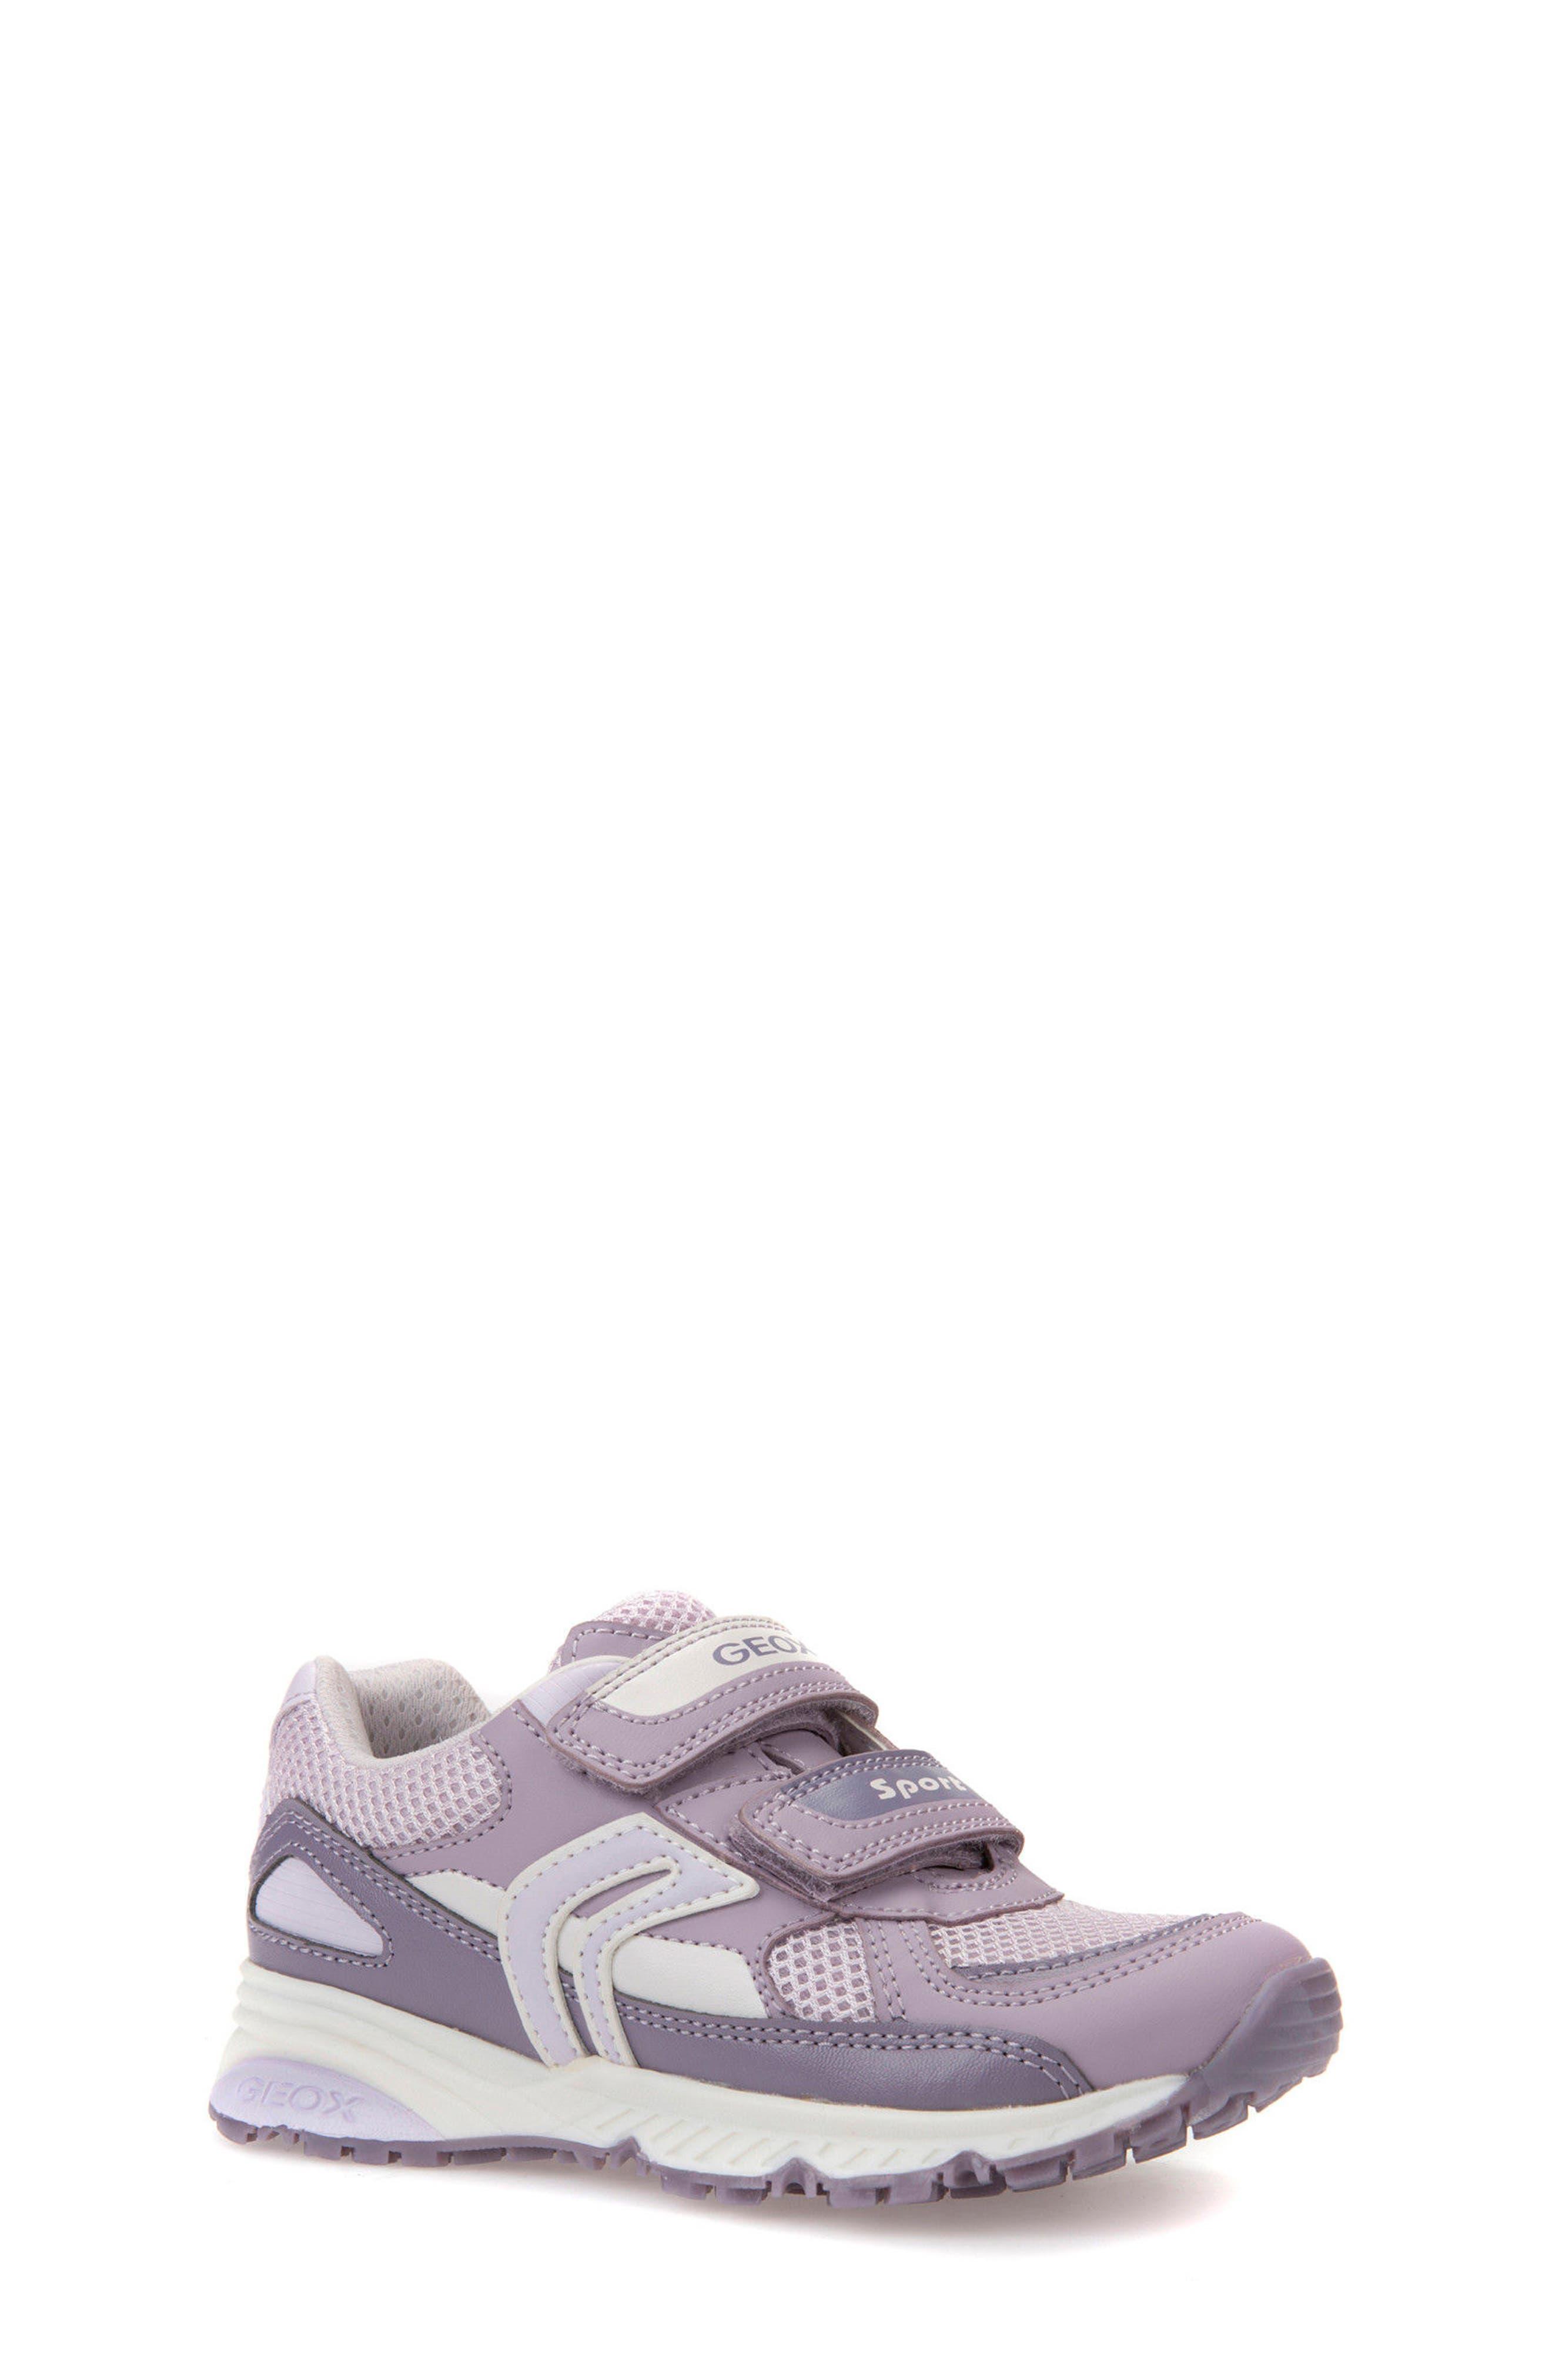 Bernie Sneaker,                             Main thumbnail 1, color,                             Rose Smoke/ Light Lilac